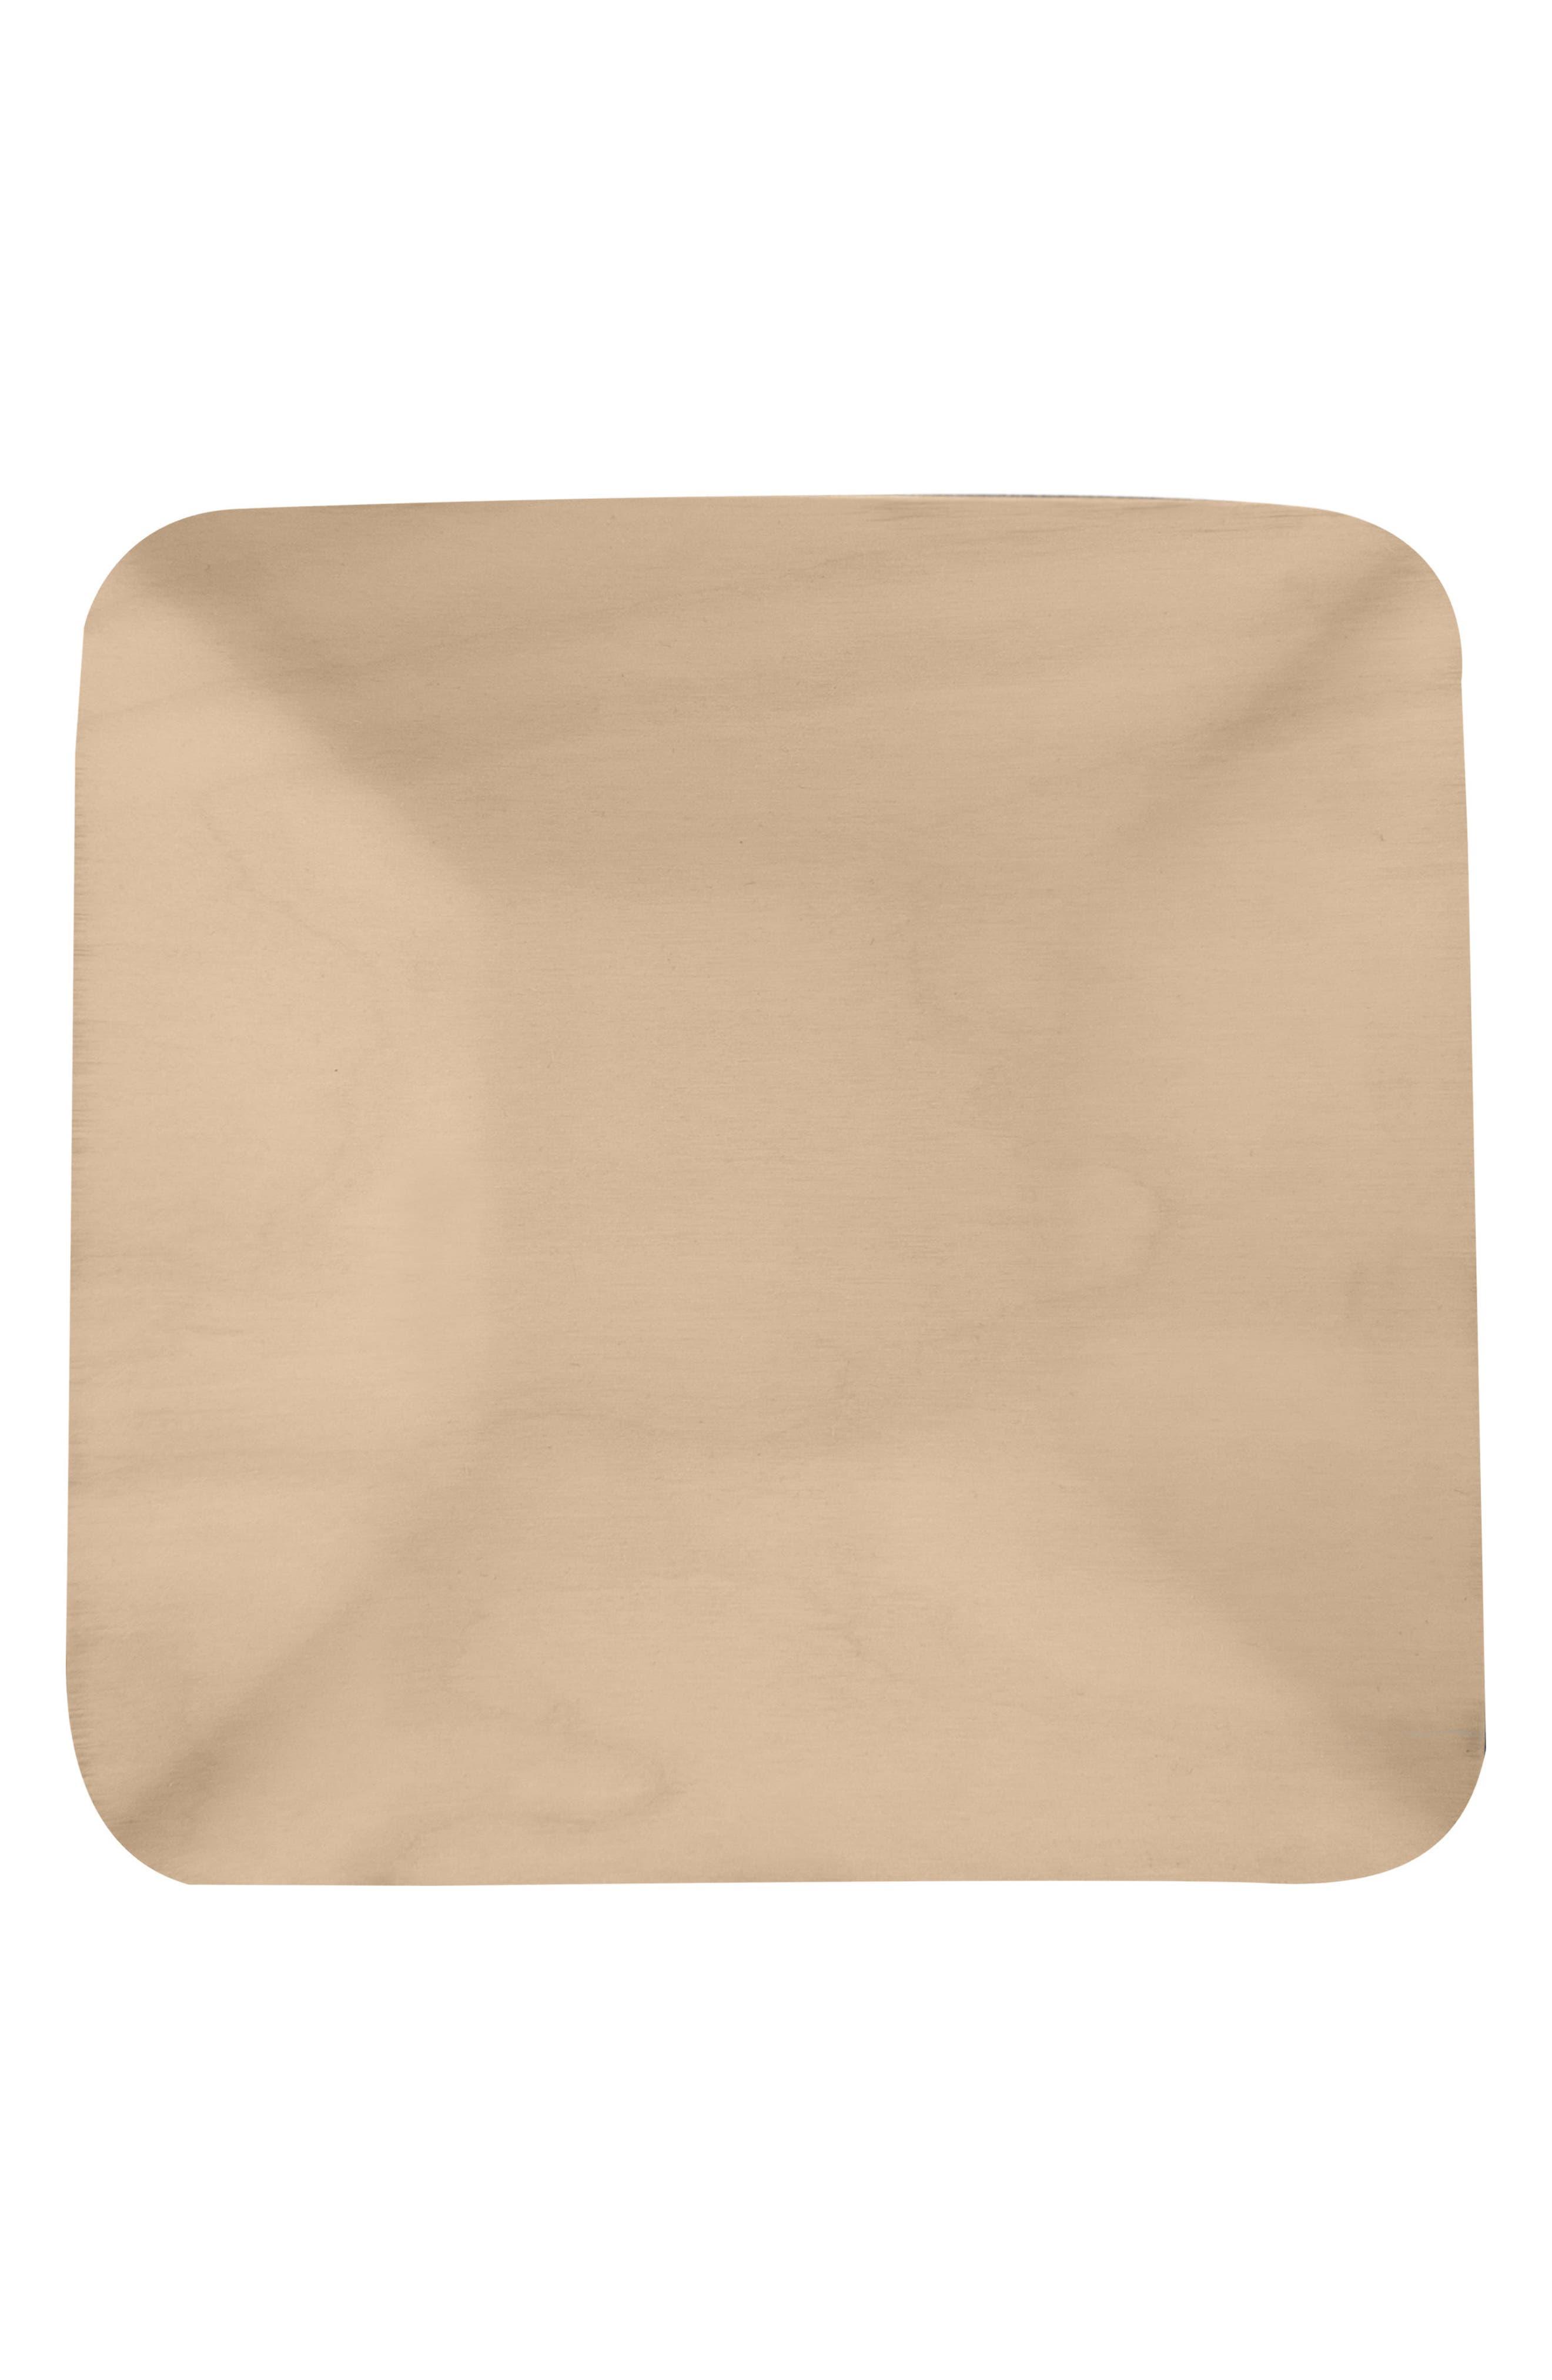 Square Birch & Melamine Serving Tray,                             Alternate thumbnail 2, color,                             250